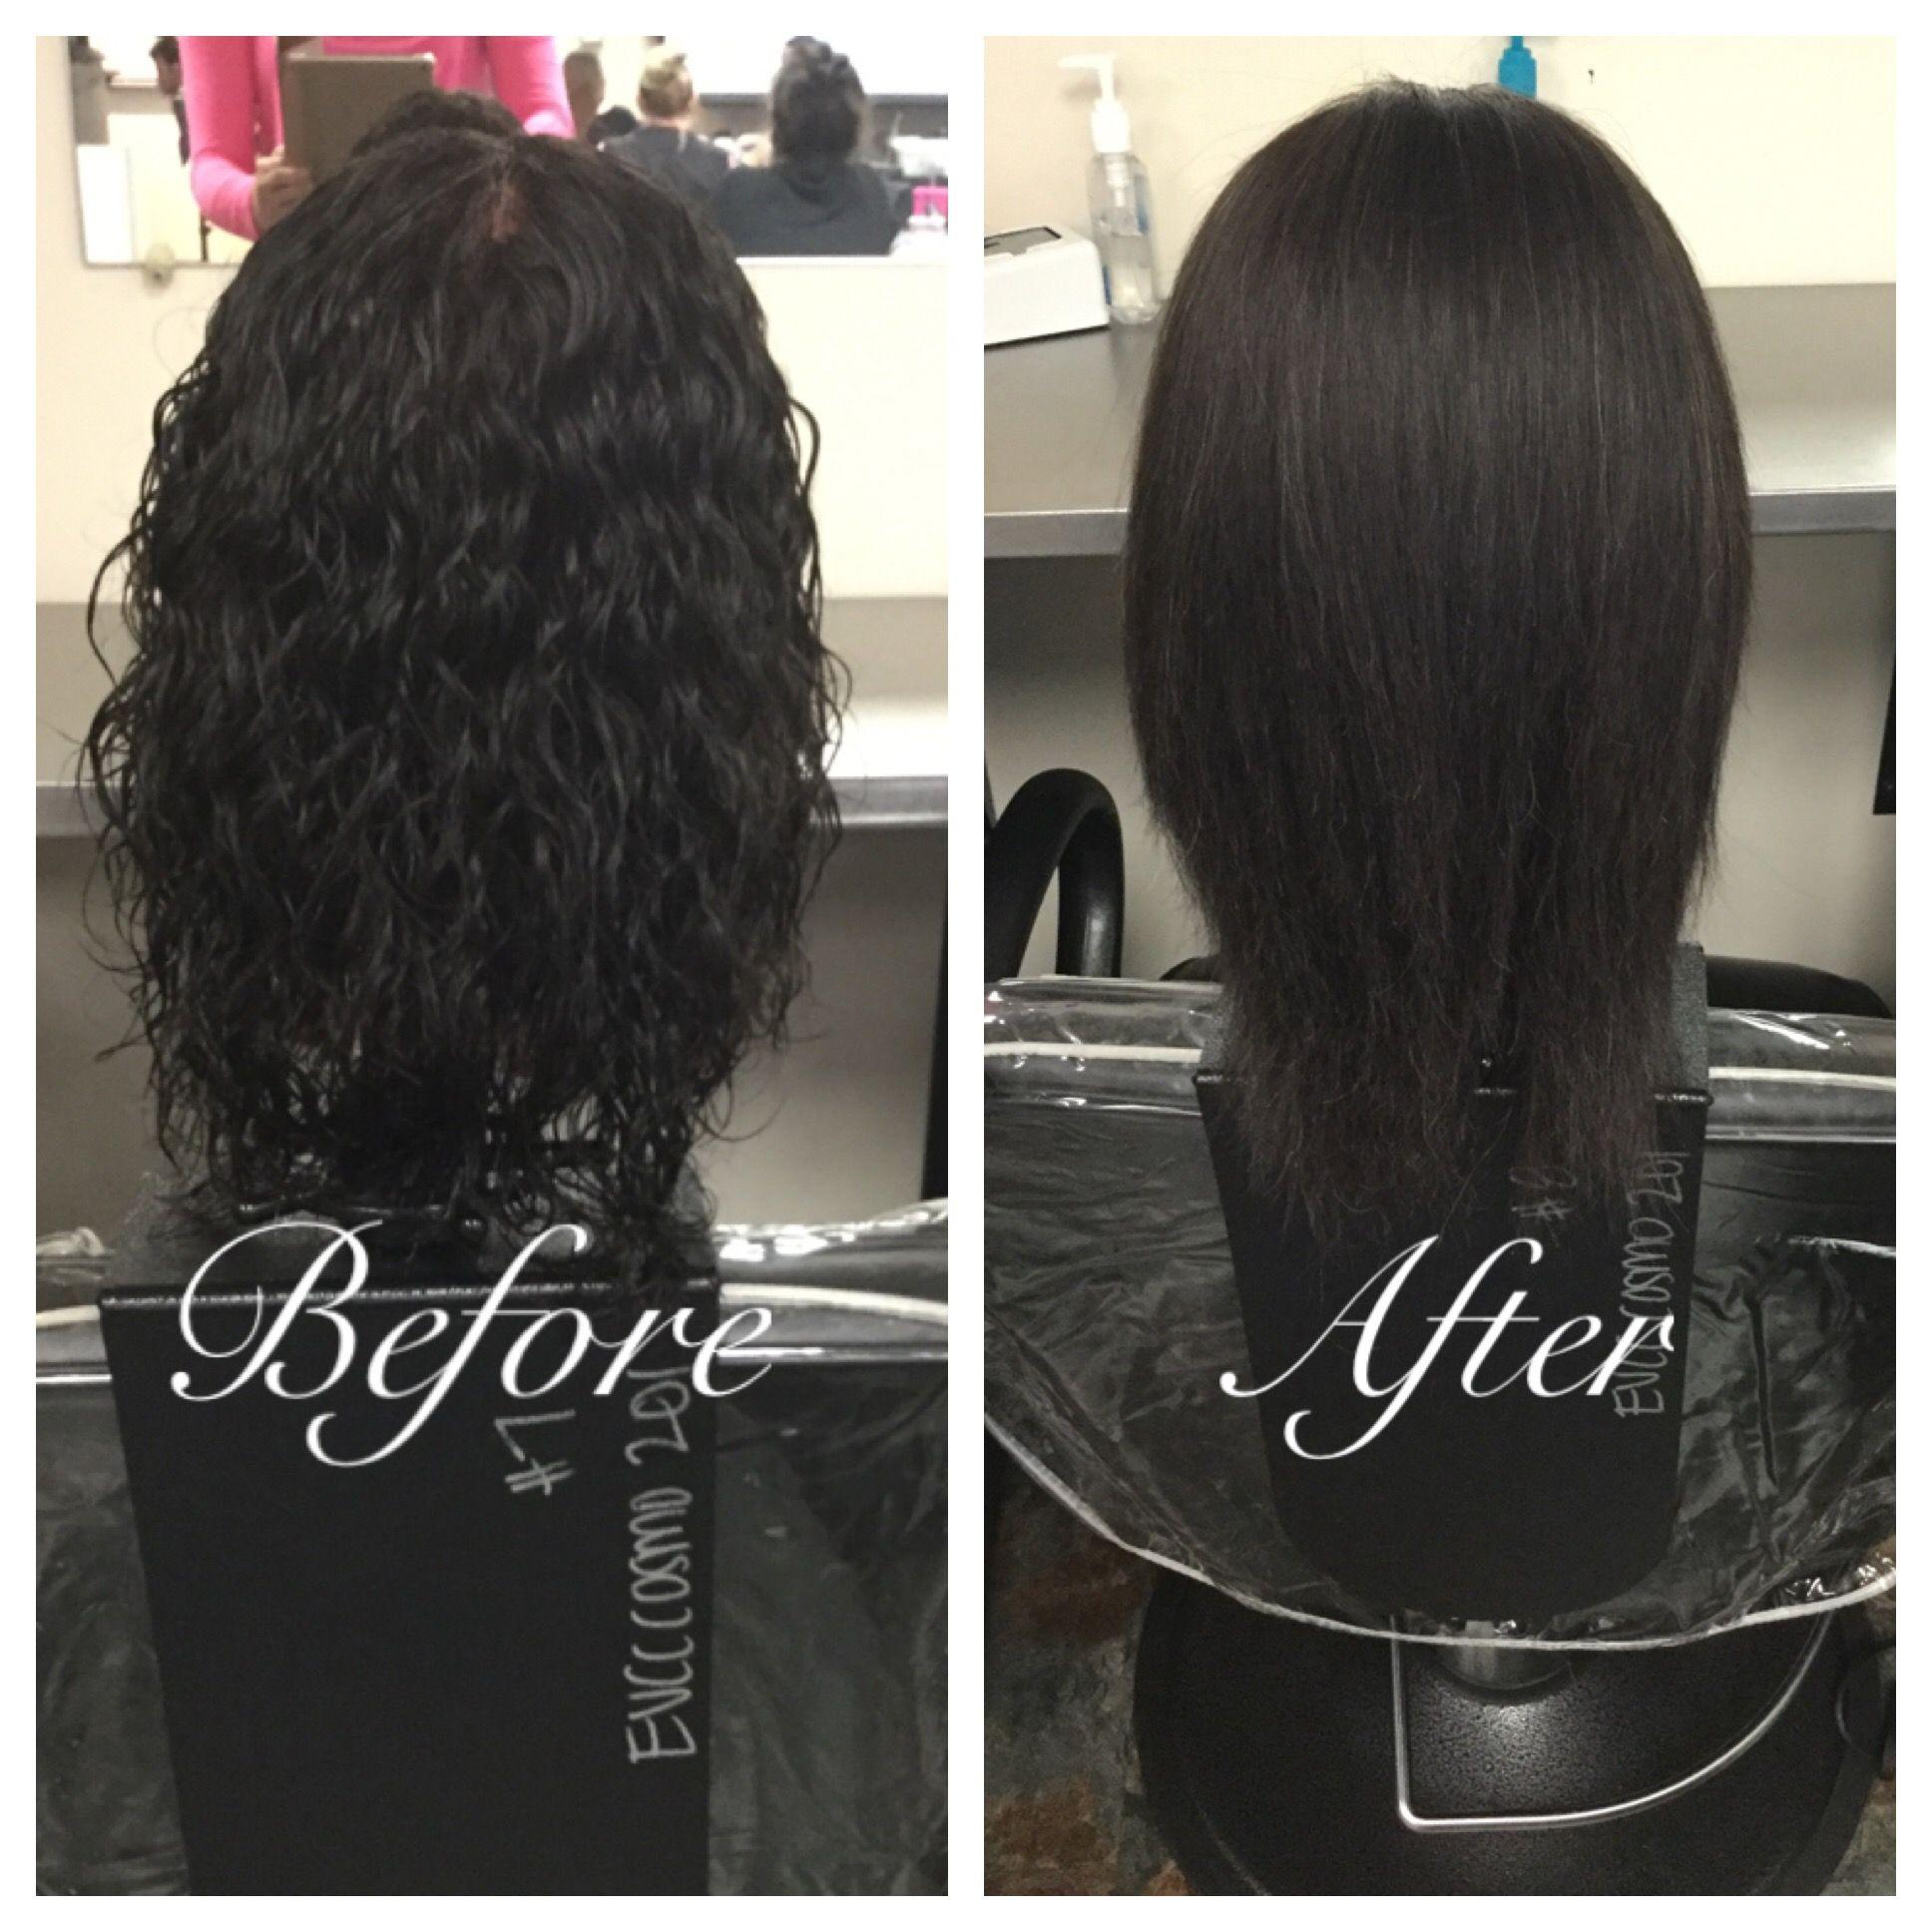 Magic straight perm vs keratin - Chemically Relaxed Hair